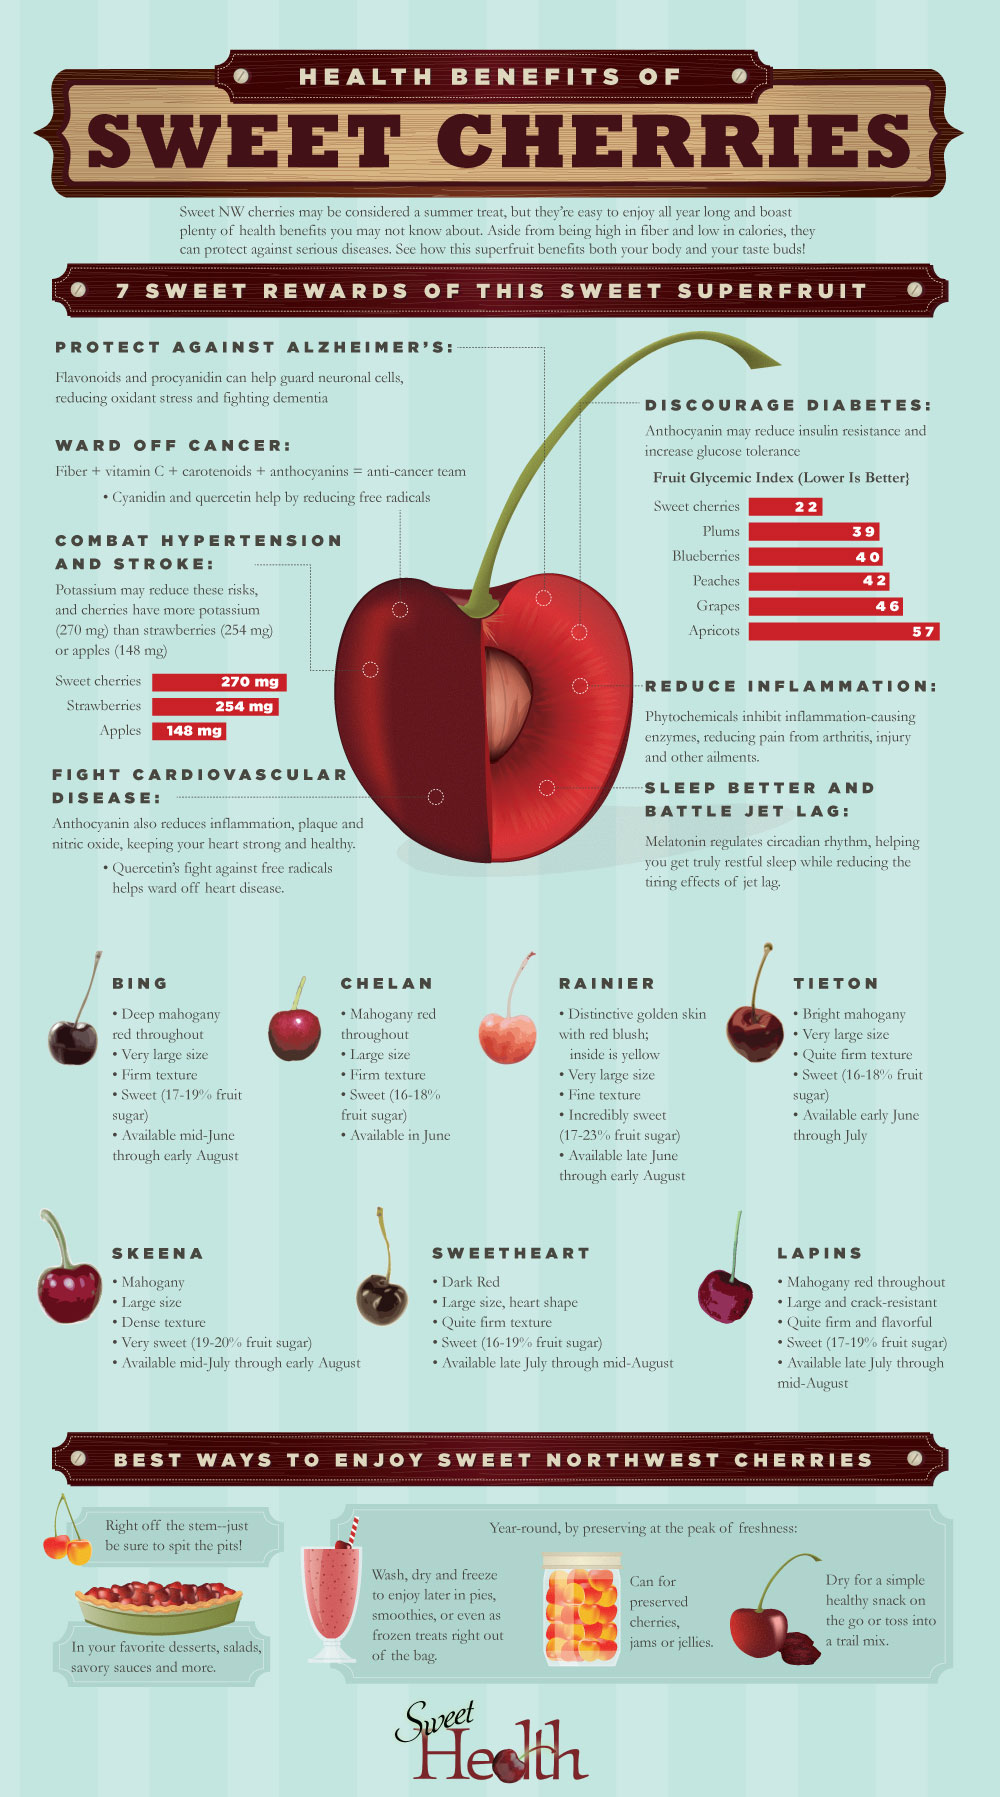 c Health-Benefits-Of-Cherries-Infographic